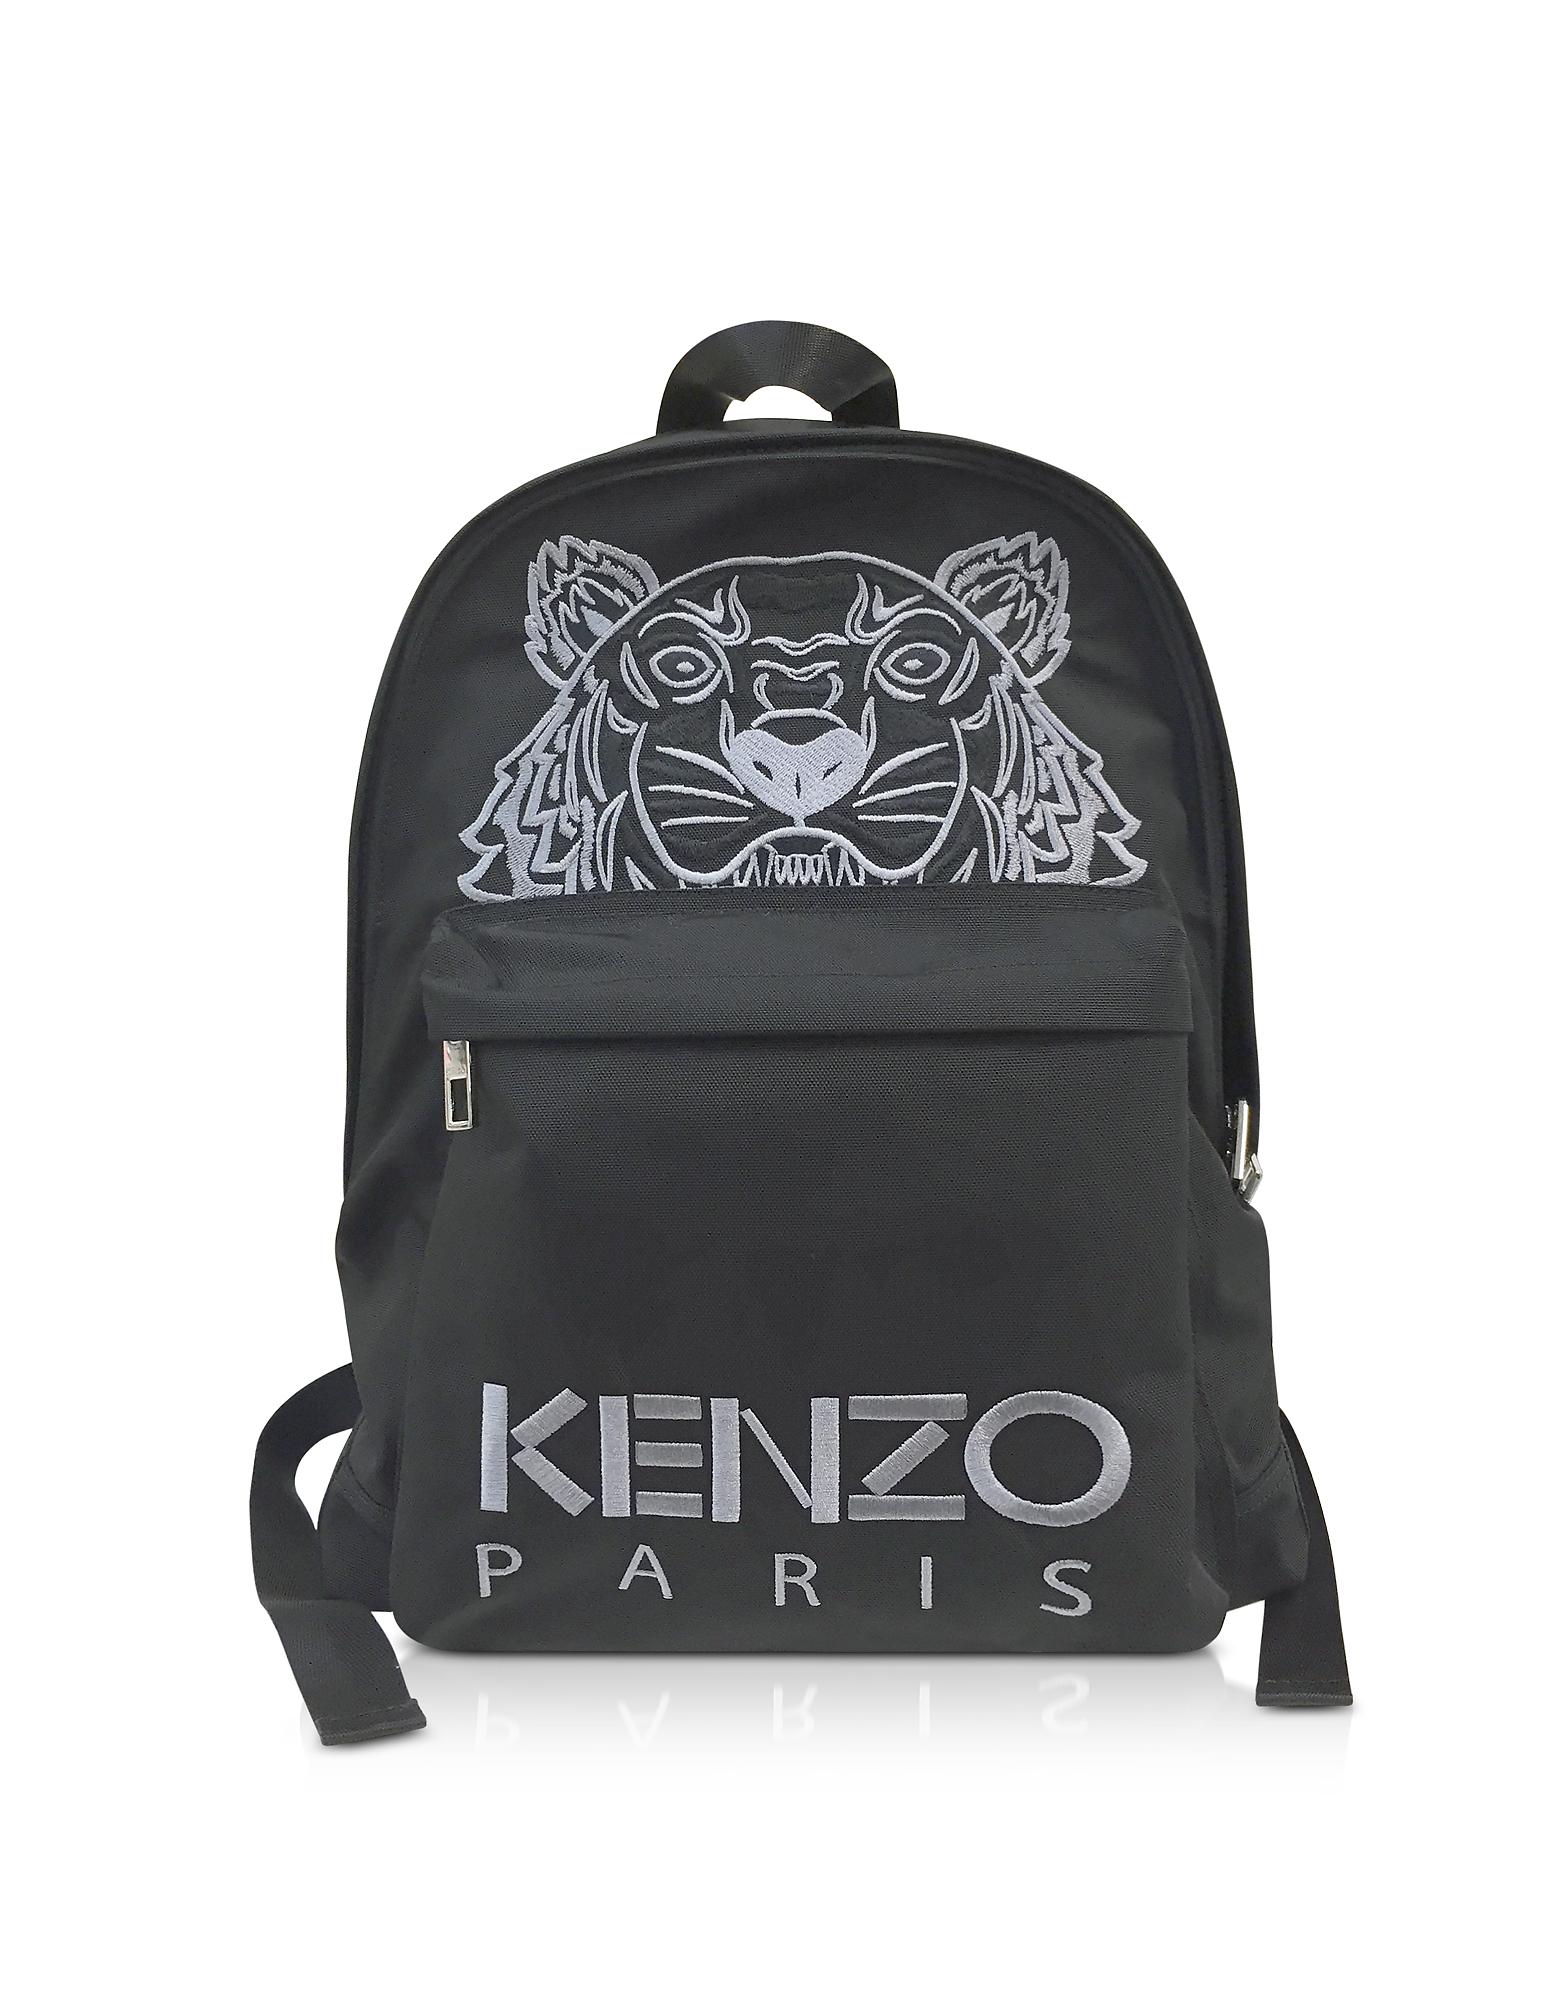 Kenzo Handbags, Black Canvas Large Tiger Backpack